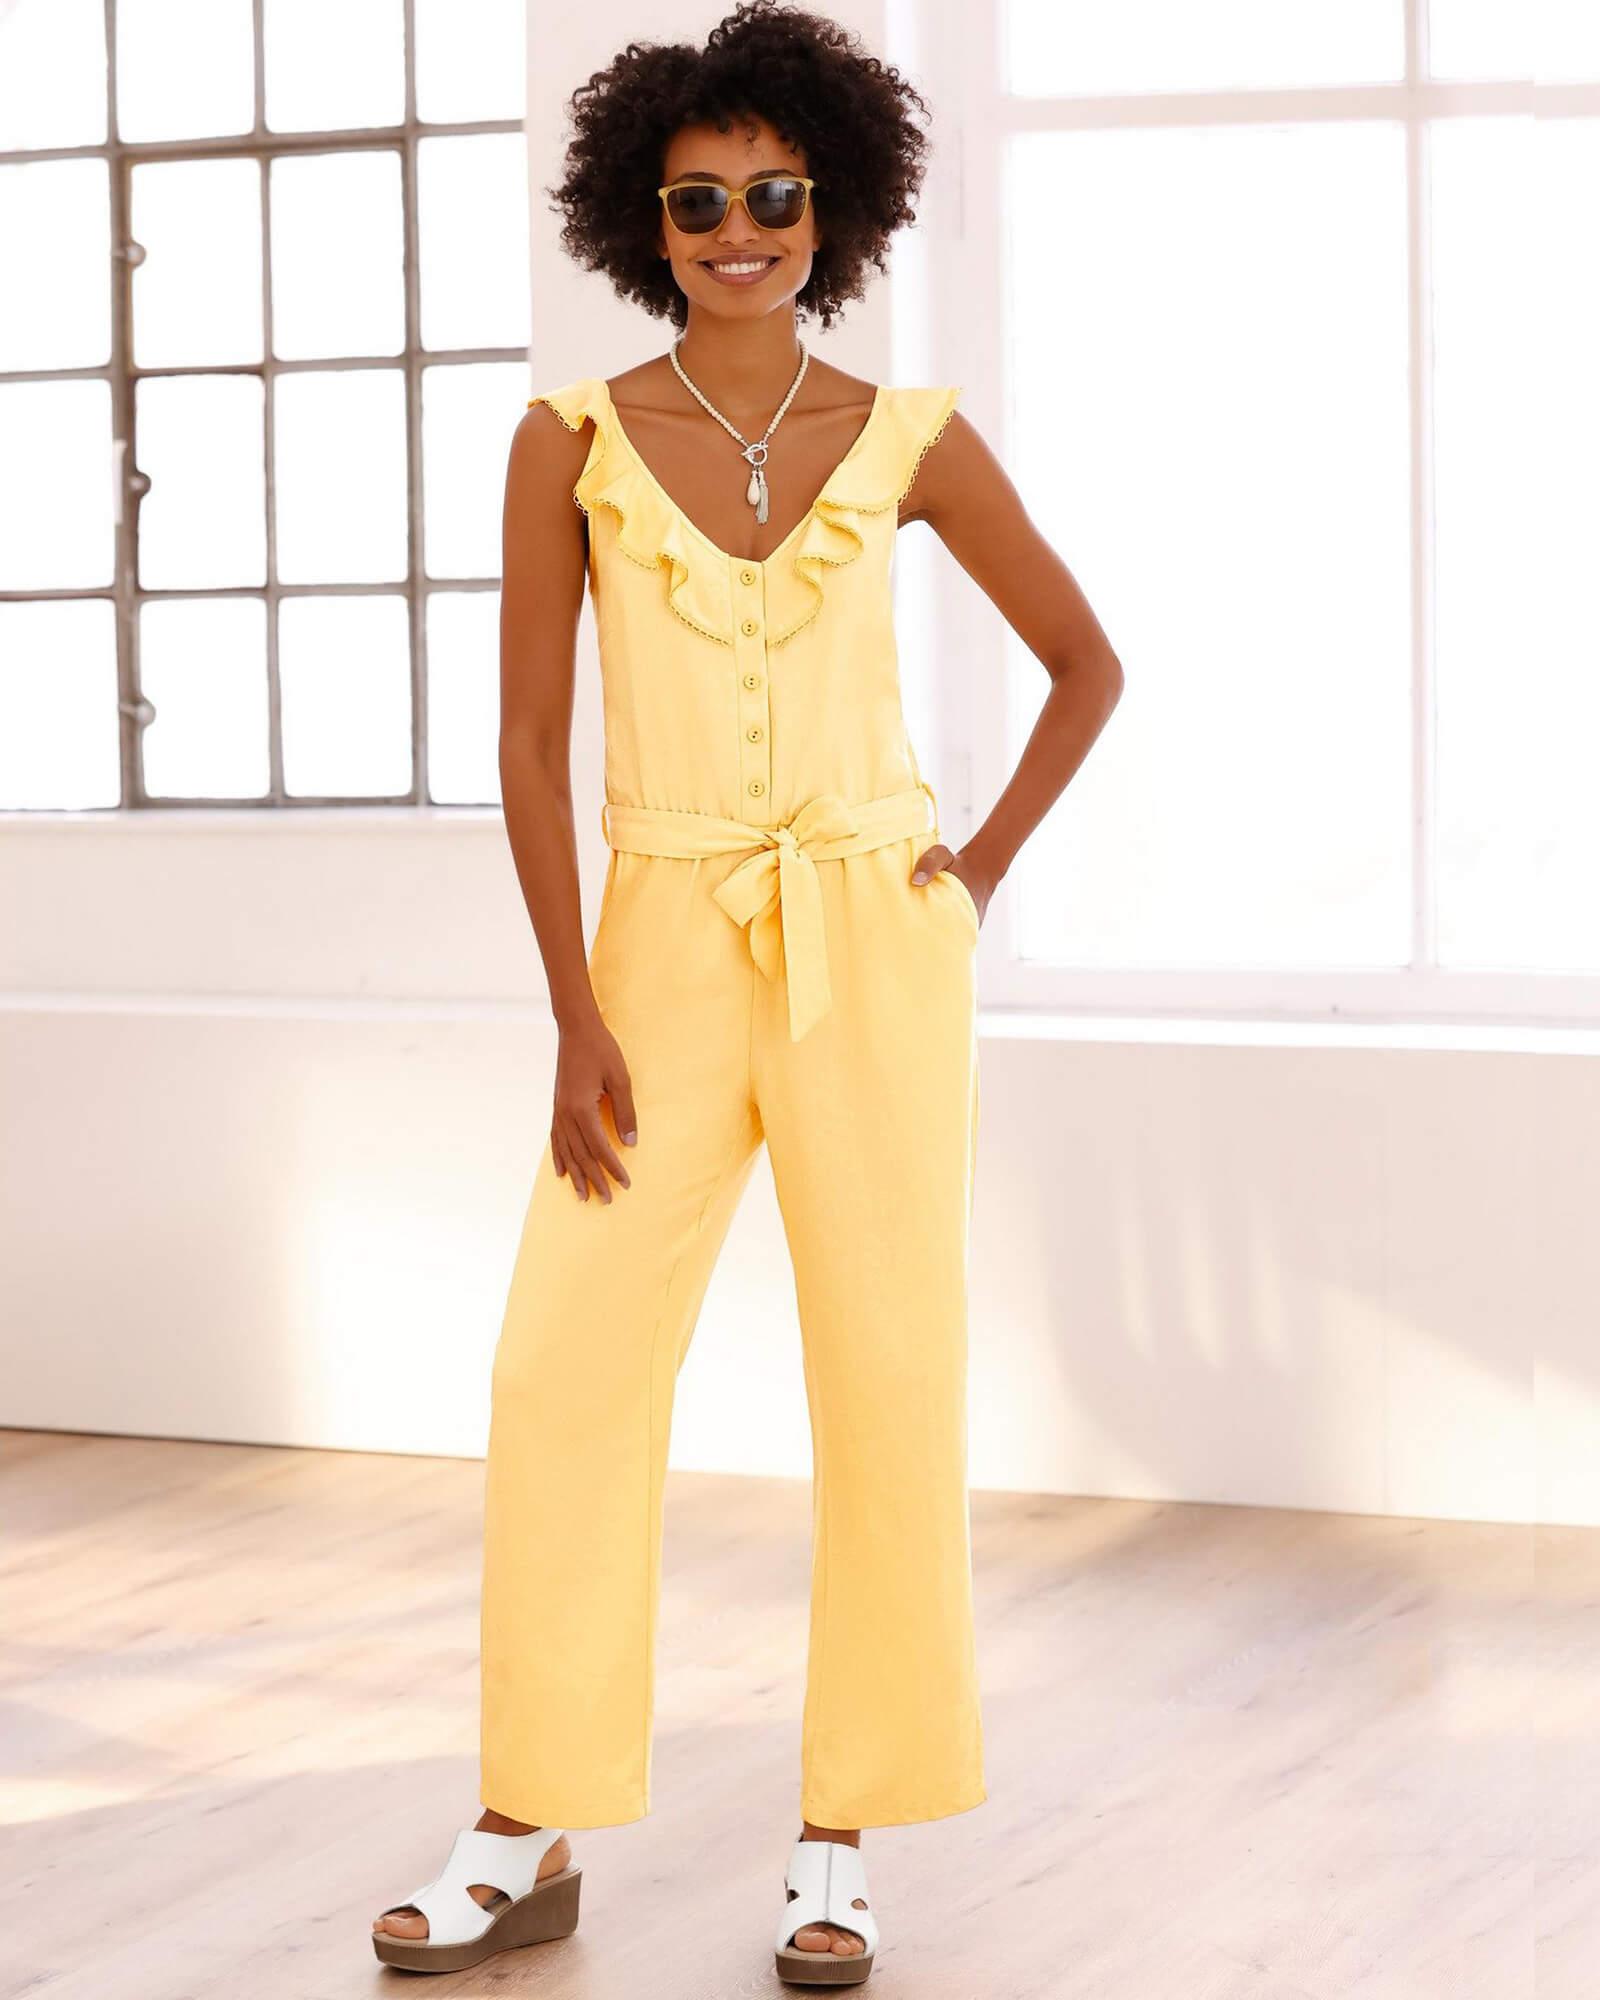 Leinen-Overall gelb